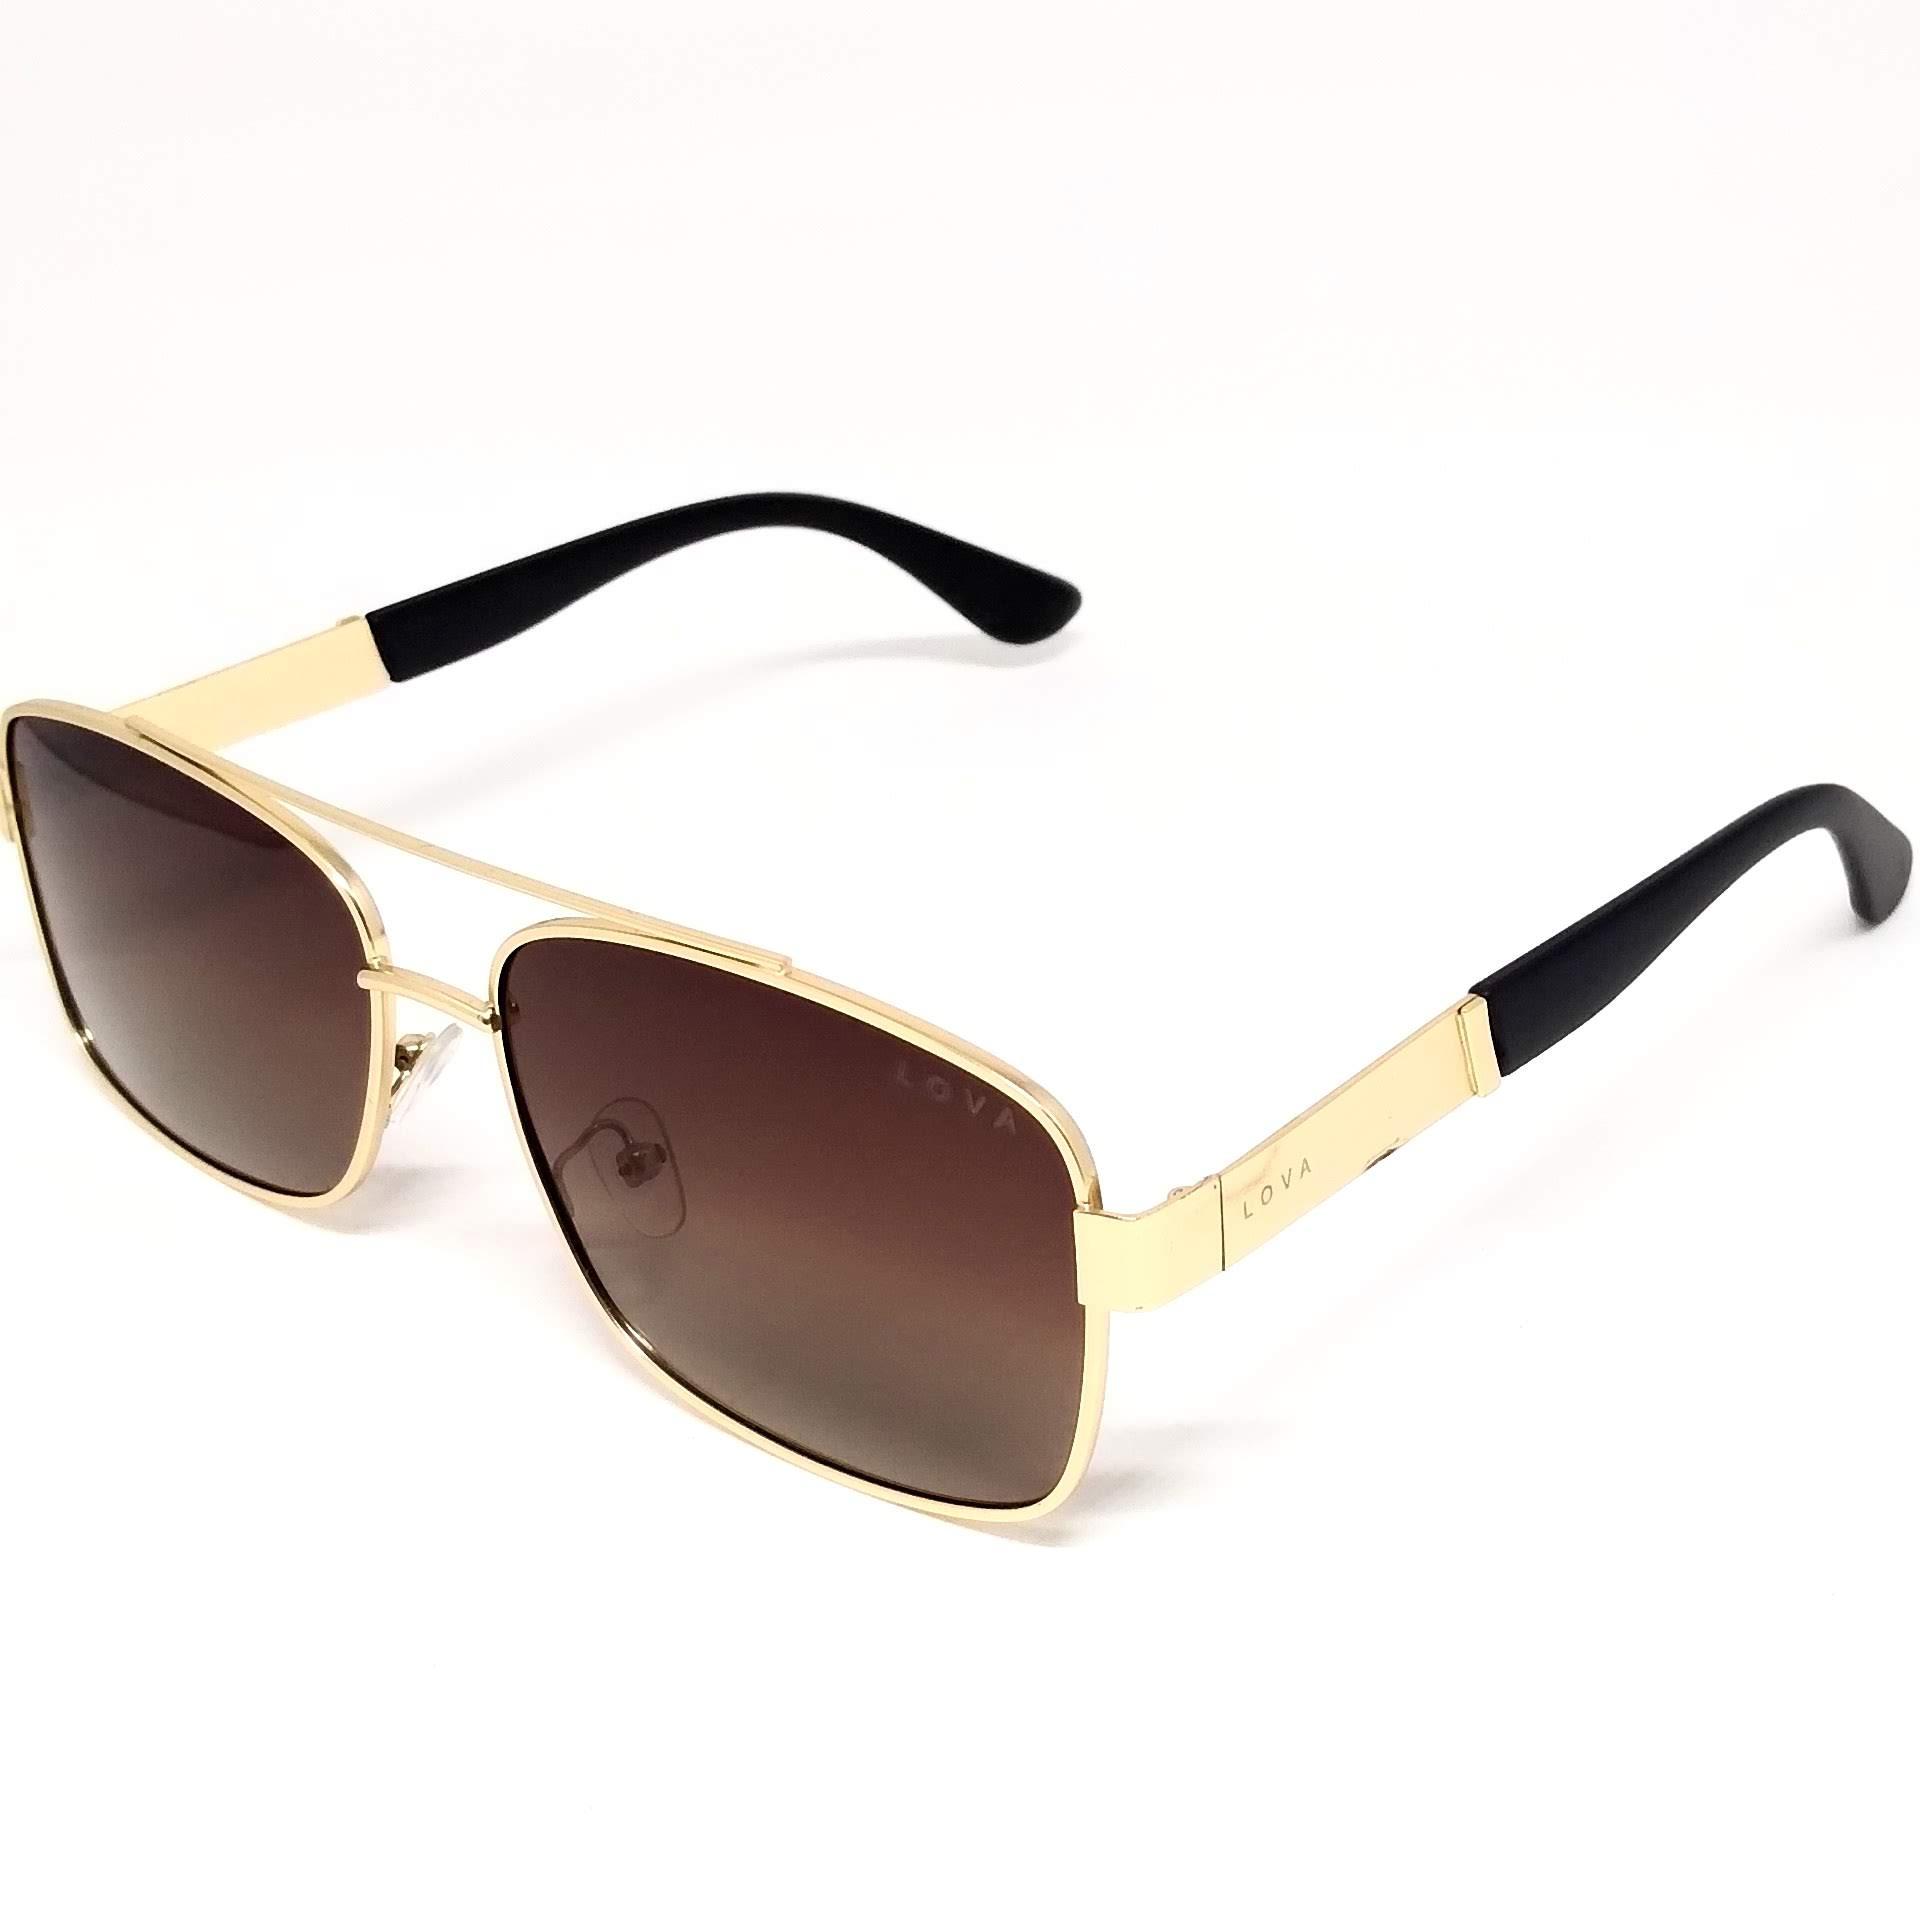 Óculos De Sol Masculino Dourado Polarizado Lova Cop Promoção